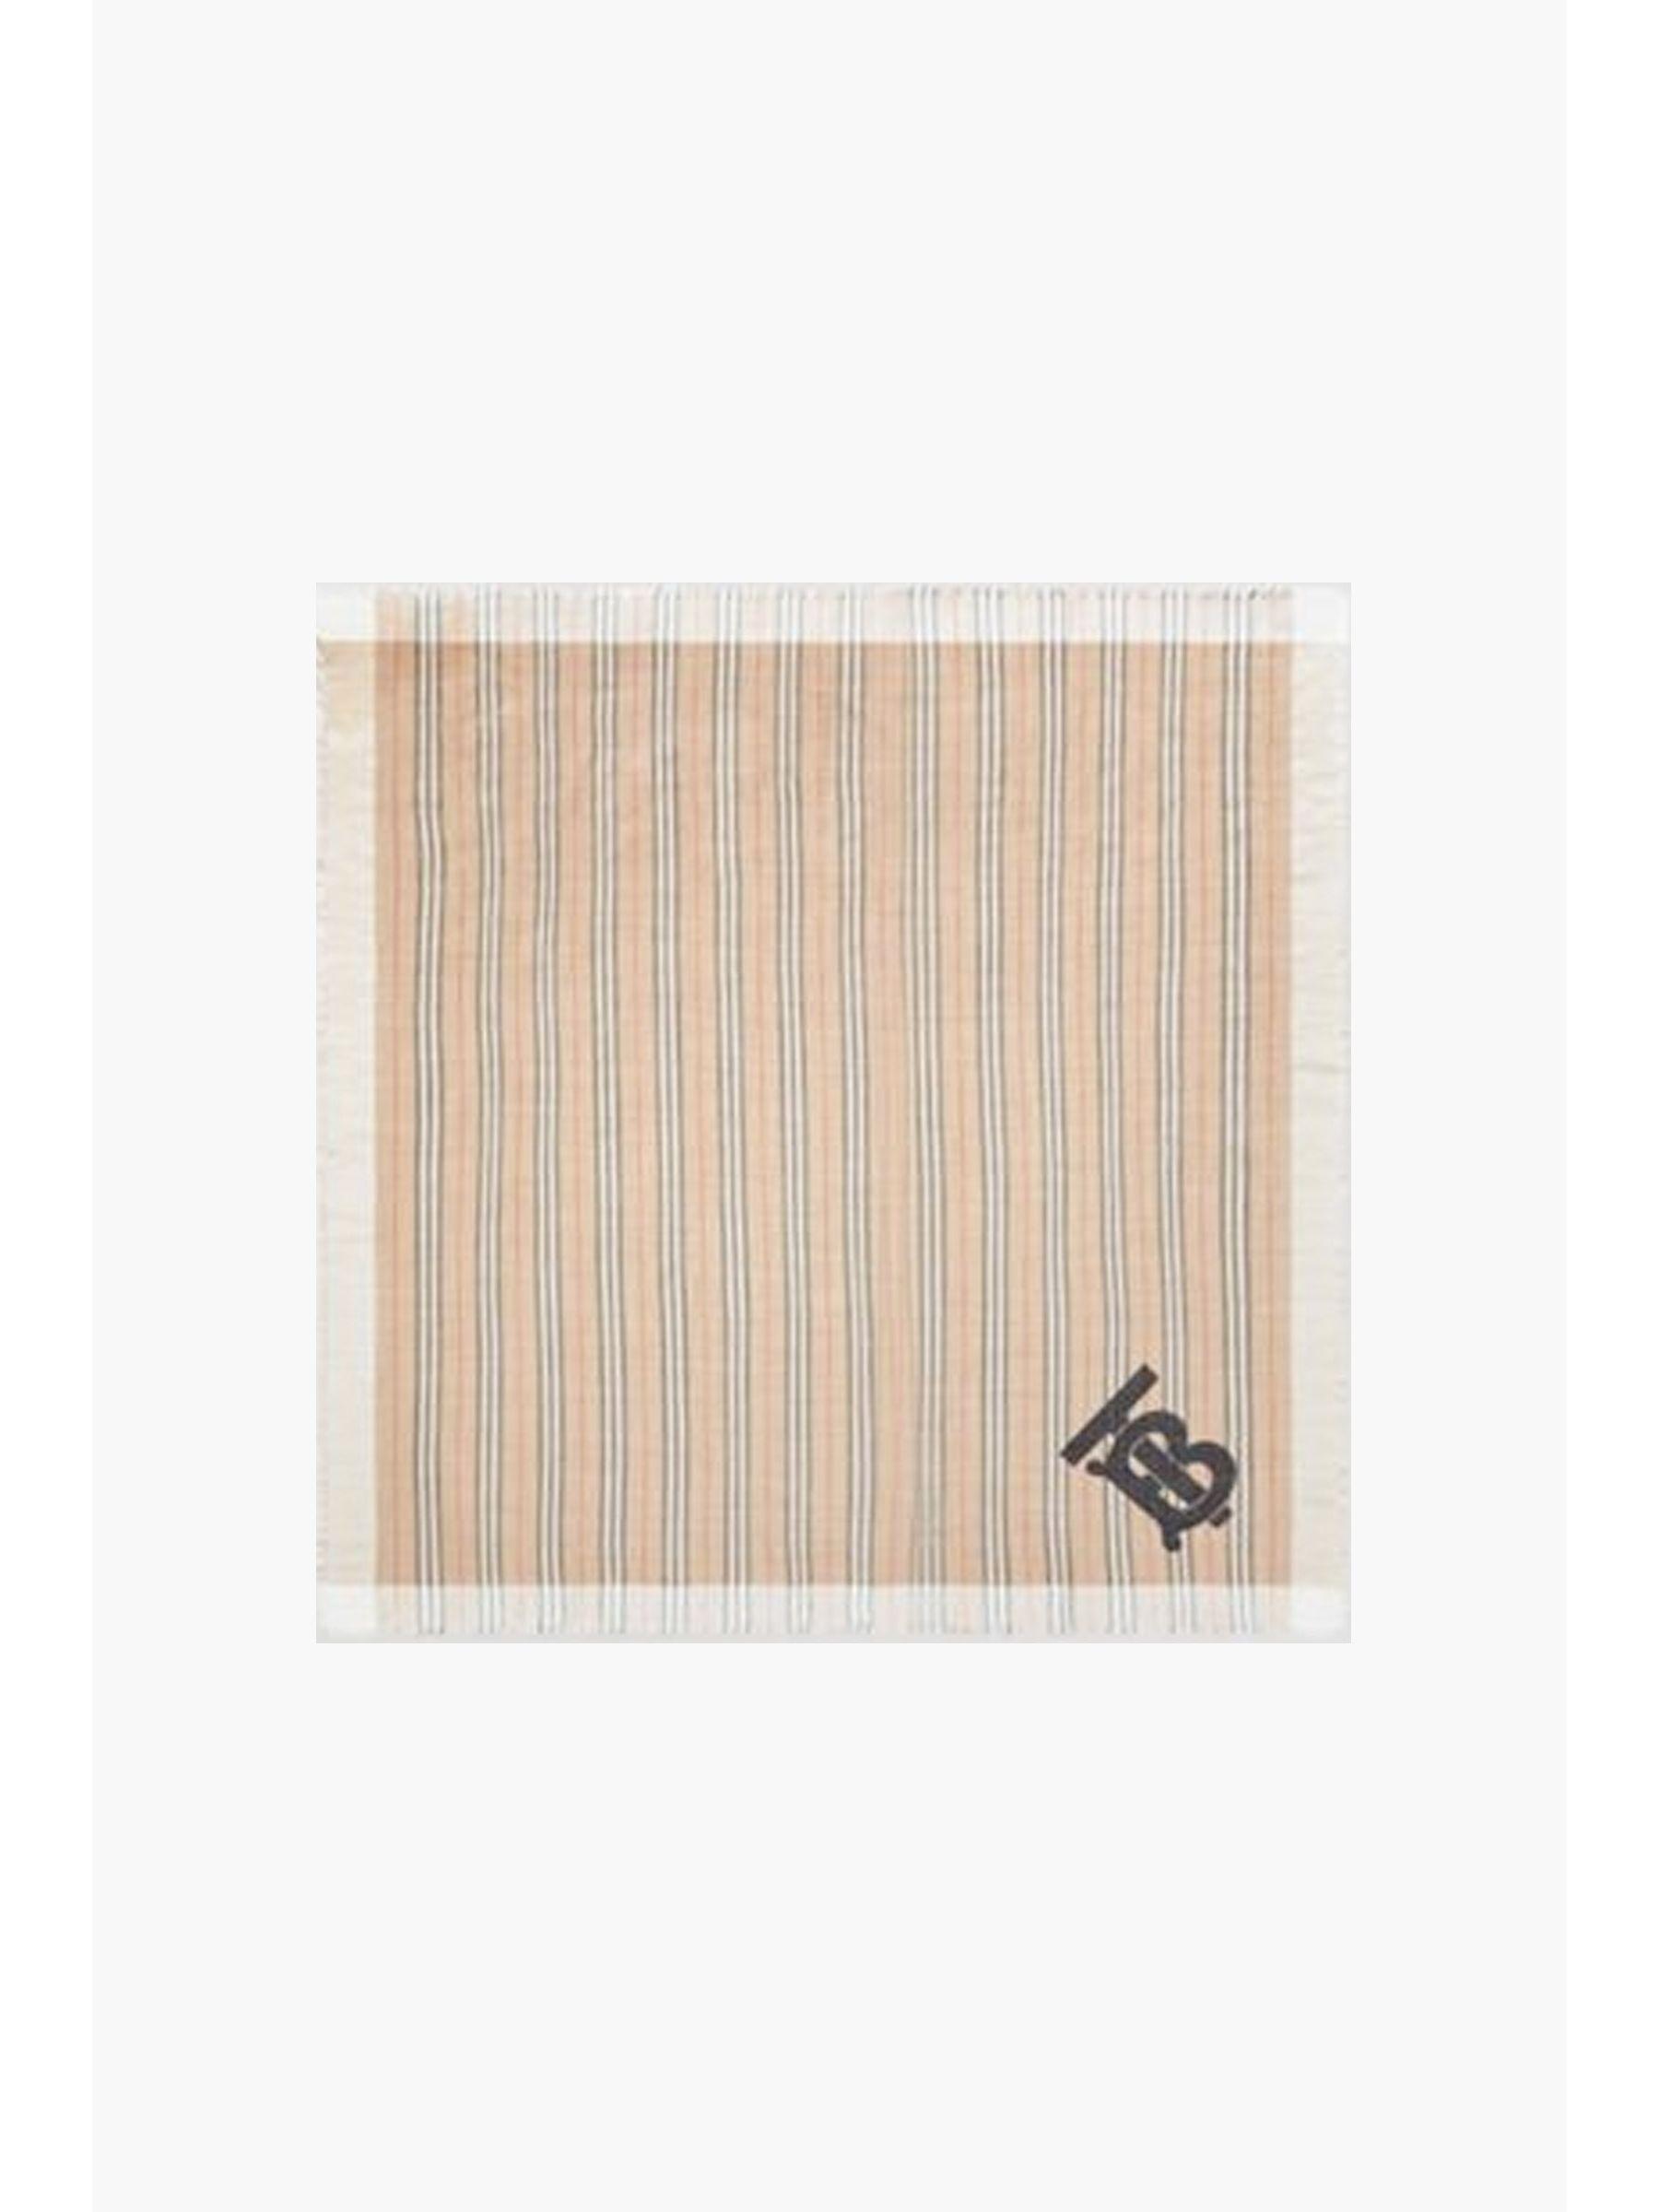 111069545a_burberry_tb_heritage_stripe_gauze_square_archieve_beige.jpg